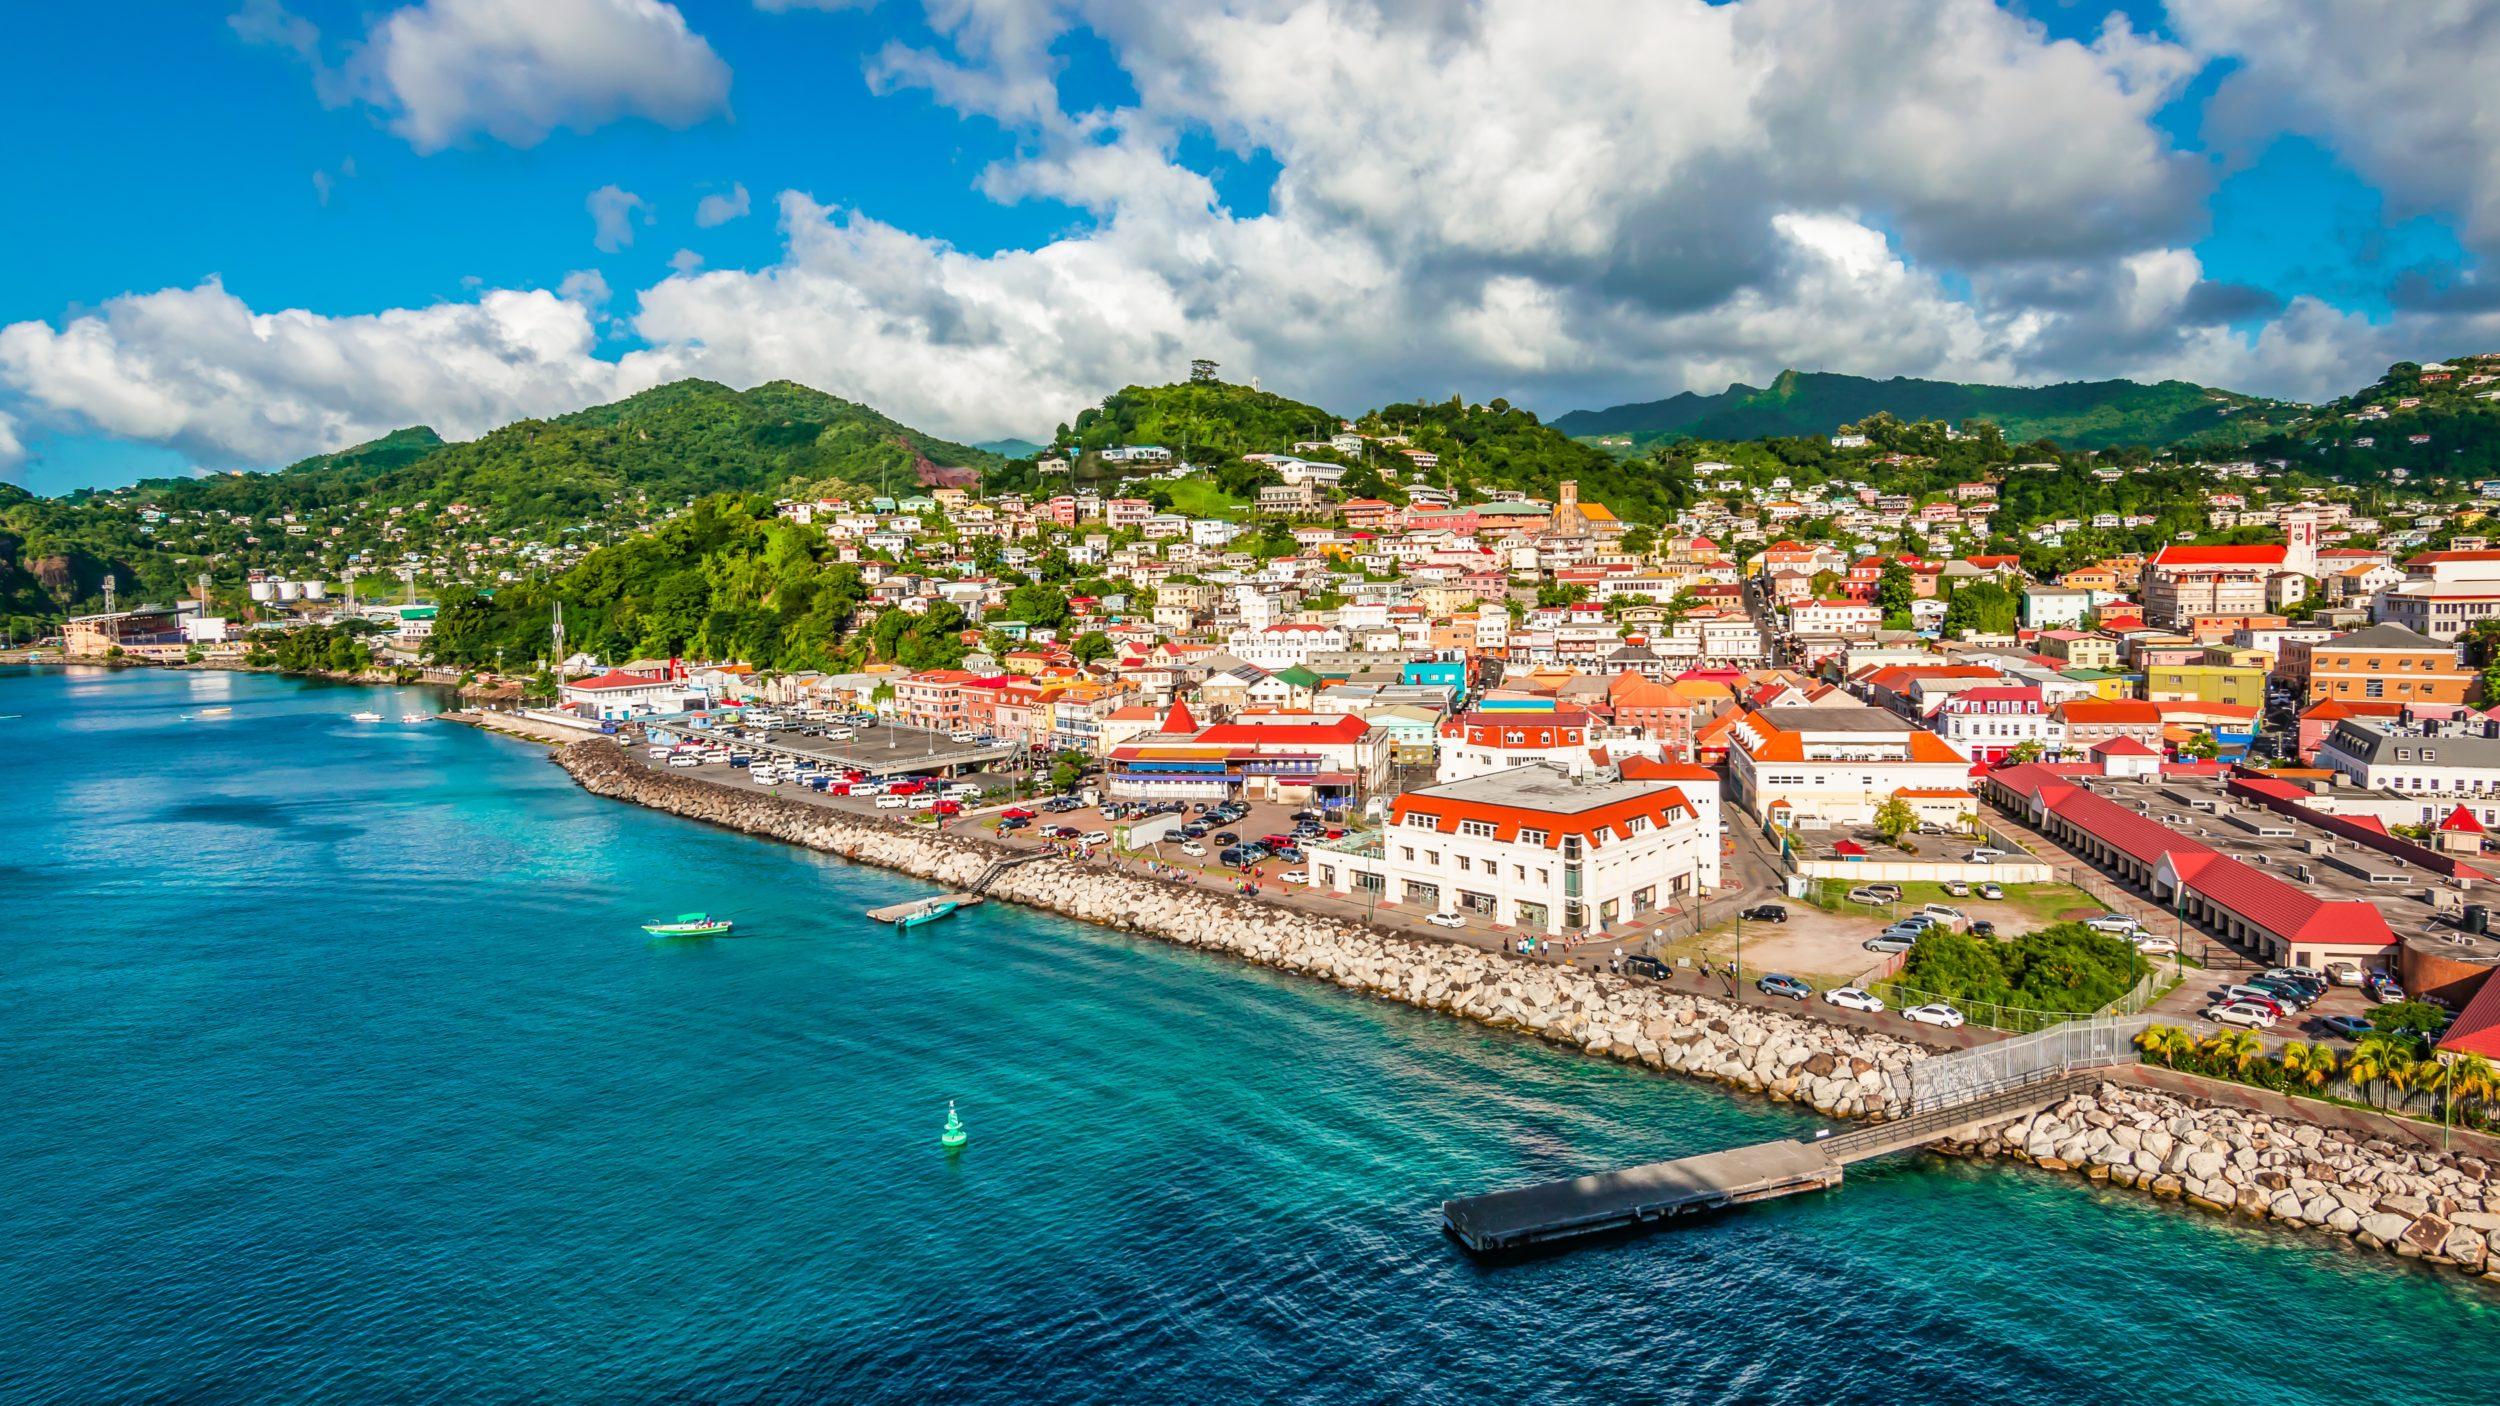 Grenada [Shutterstock]